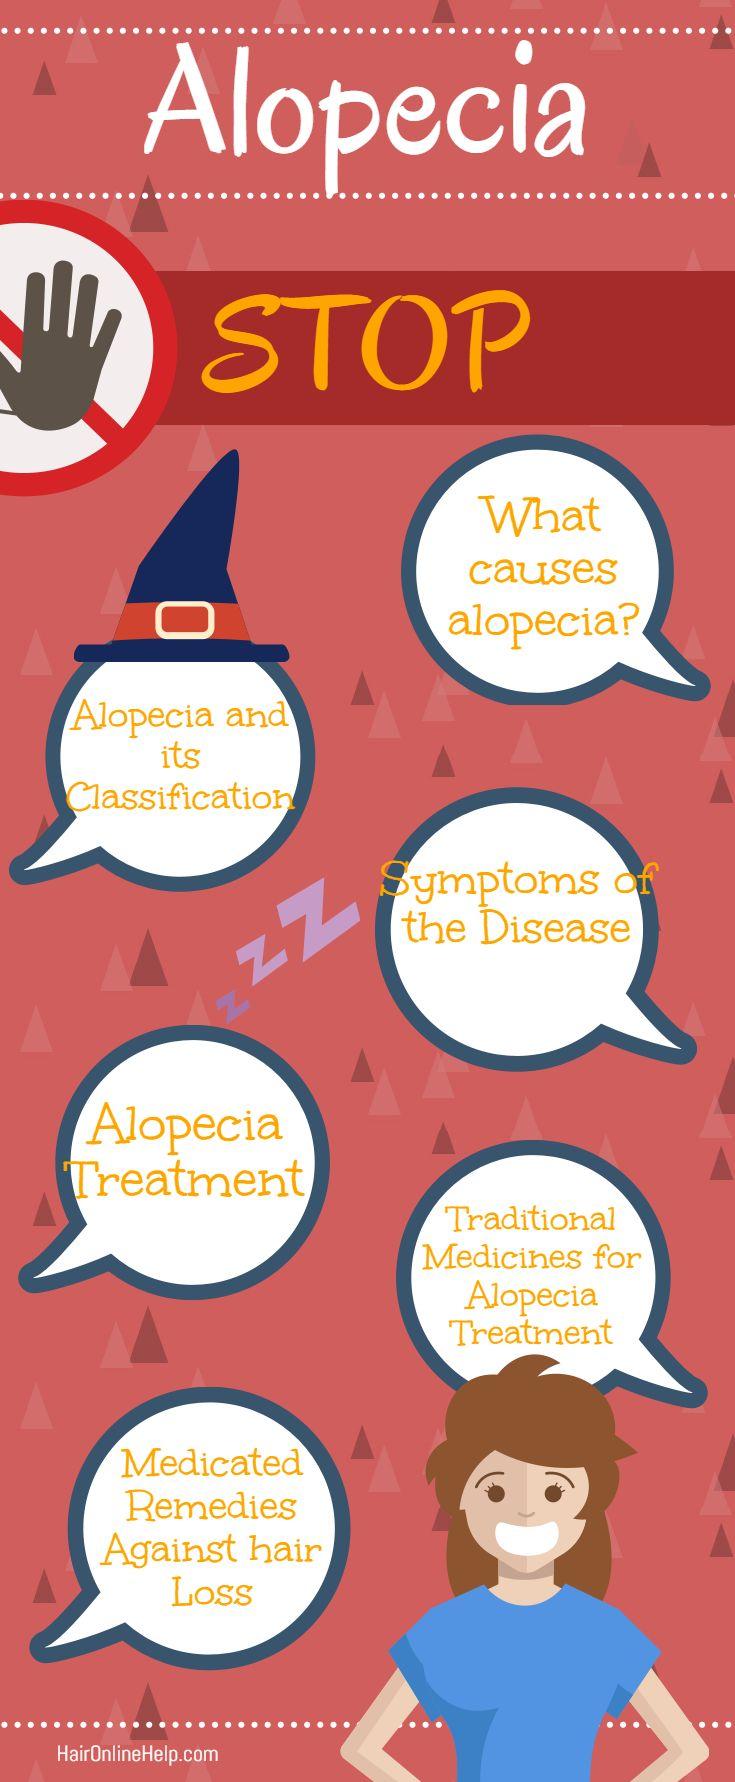 Alopecia causes and treatment